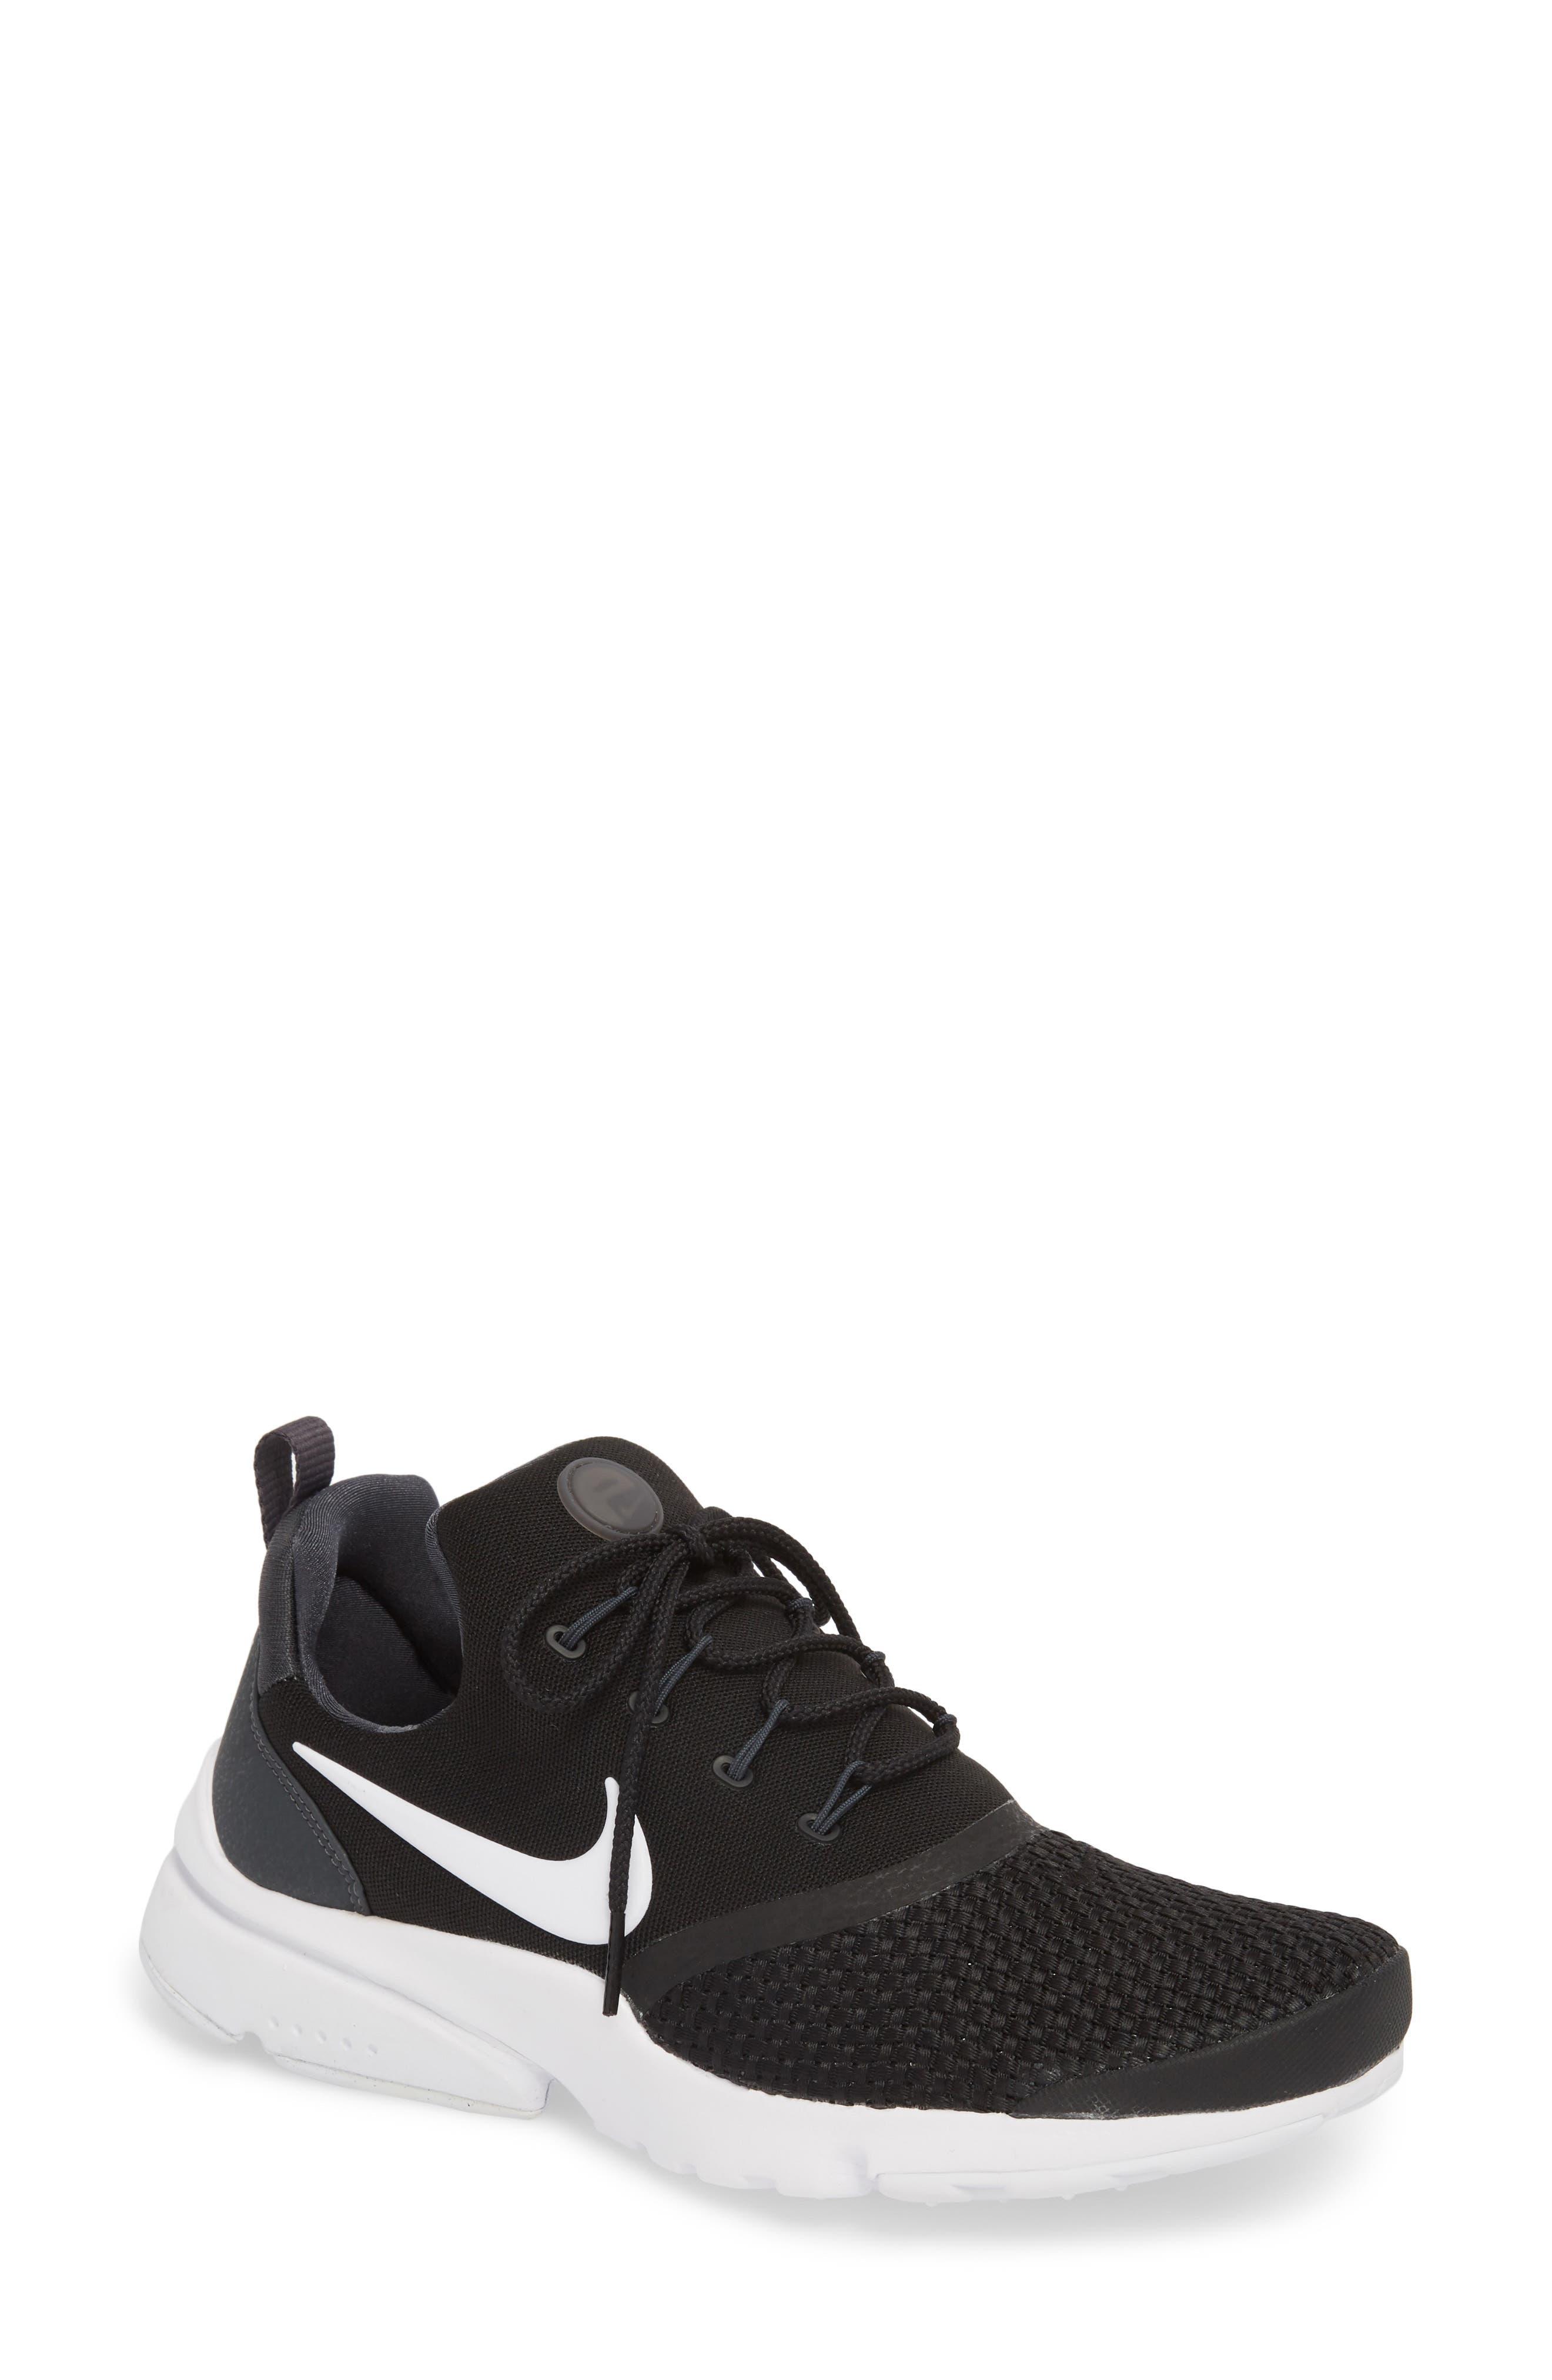 Presto Fly Sneaker,                         Main,                         color, BLACK/ WHITE/ ANTHRACITE